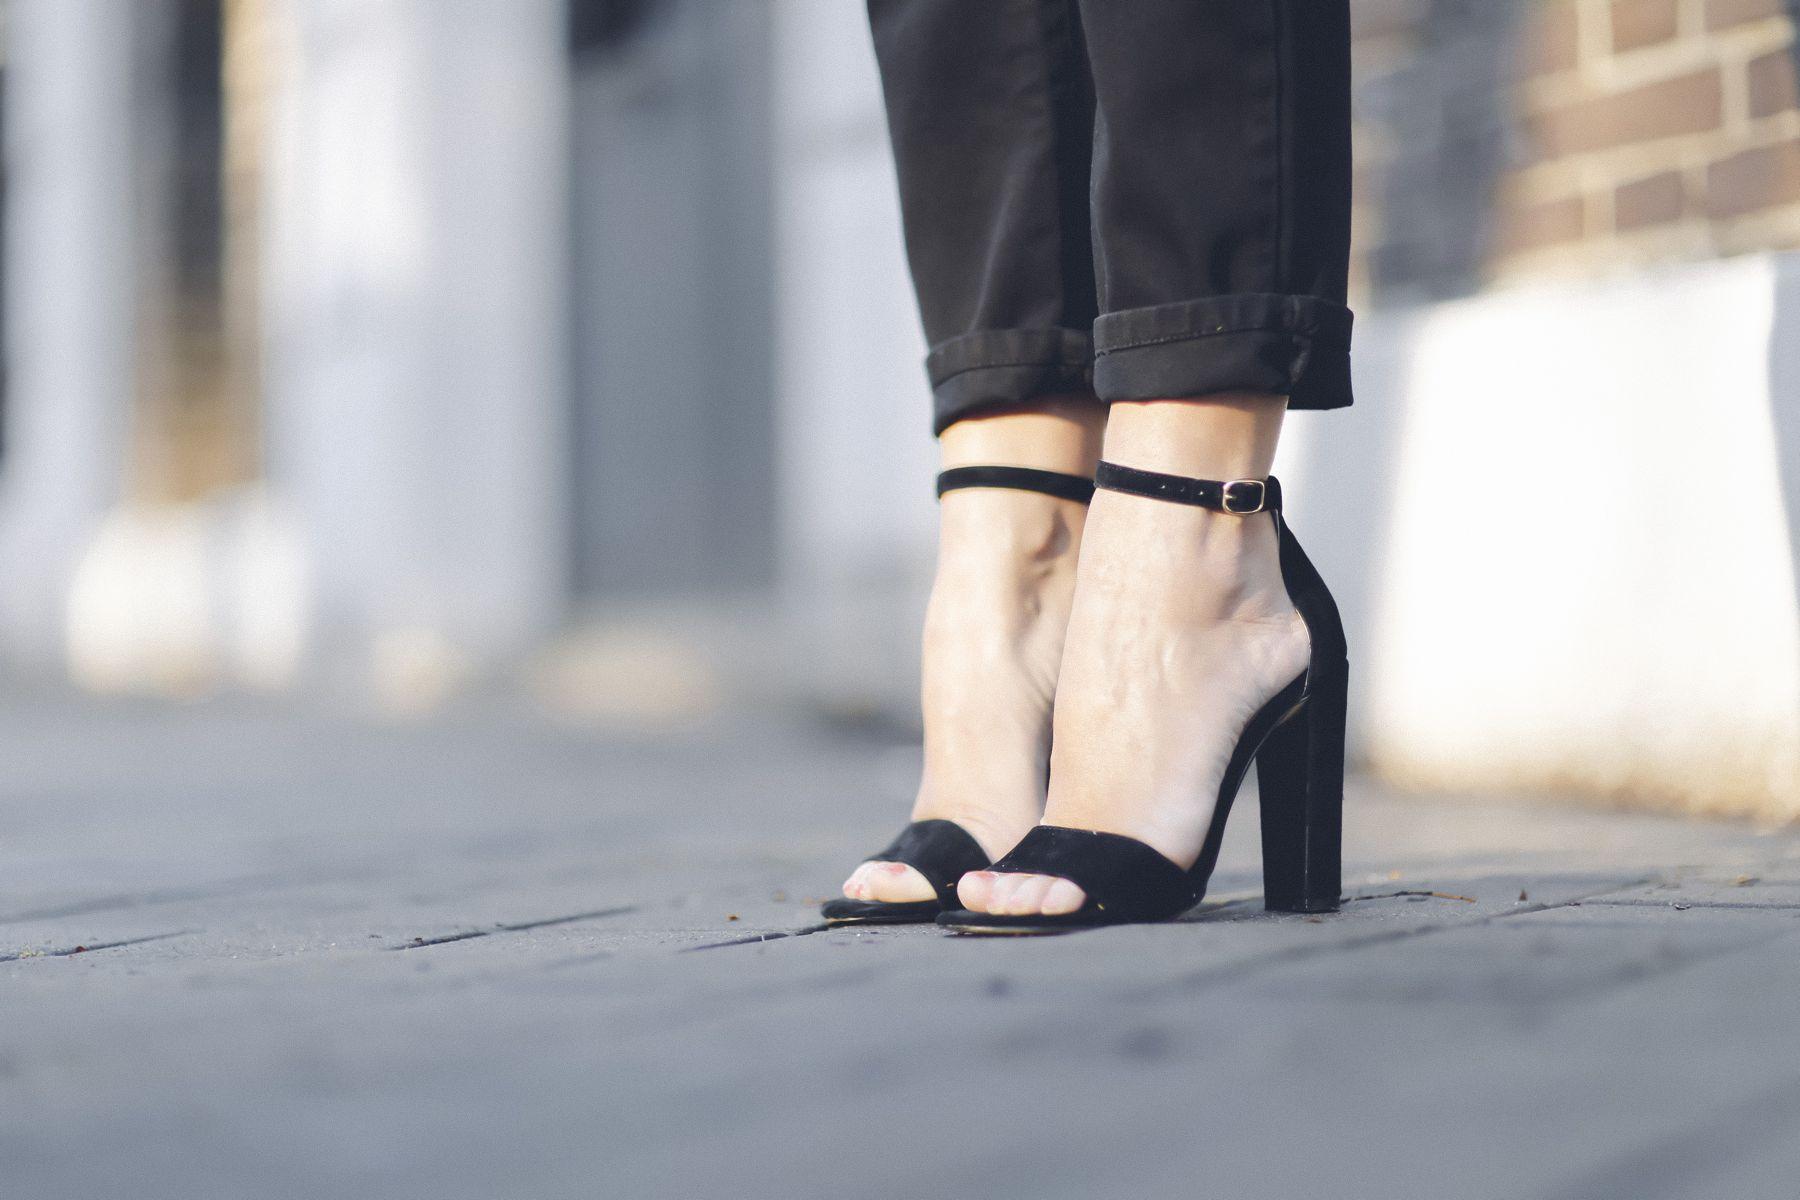 sandalias sandals mbym outfit look primavera spring camiseta zara steve madden Dior gafas de sol sunglasses street style trendy taste_8